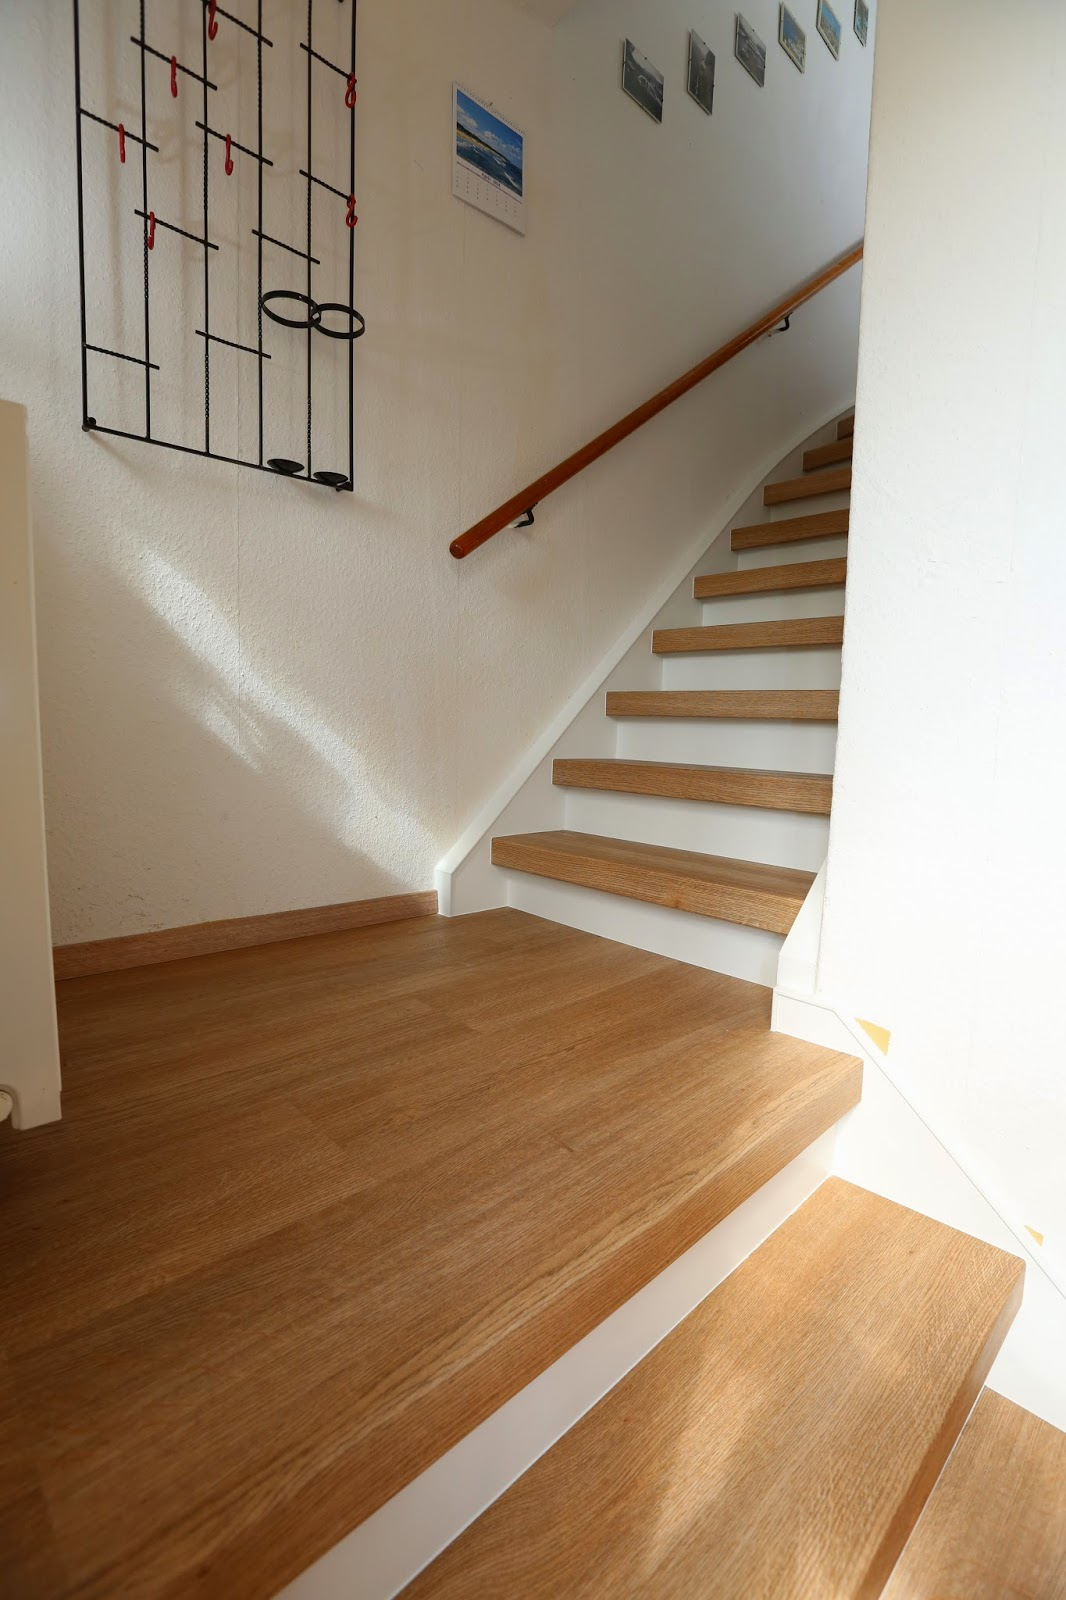 h k treppenrenovierung ihre treppenrenovierung unser gratis check. Black Bedroom Furniture Sets. Home Design Ideas